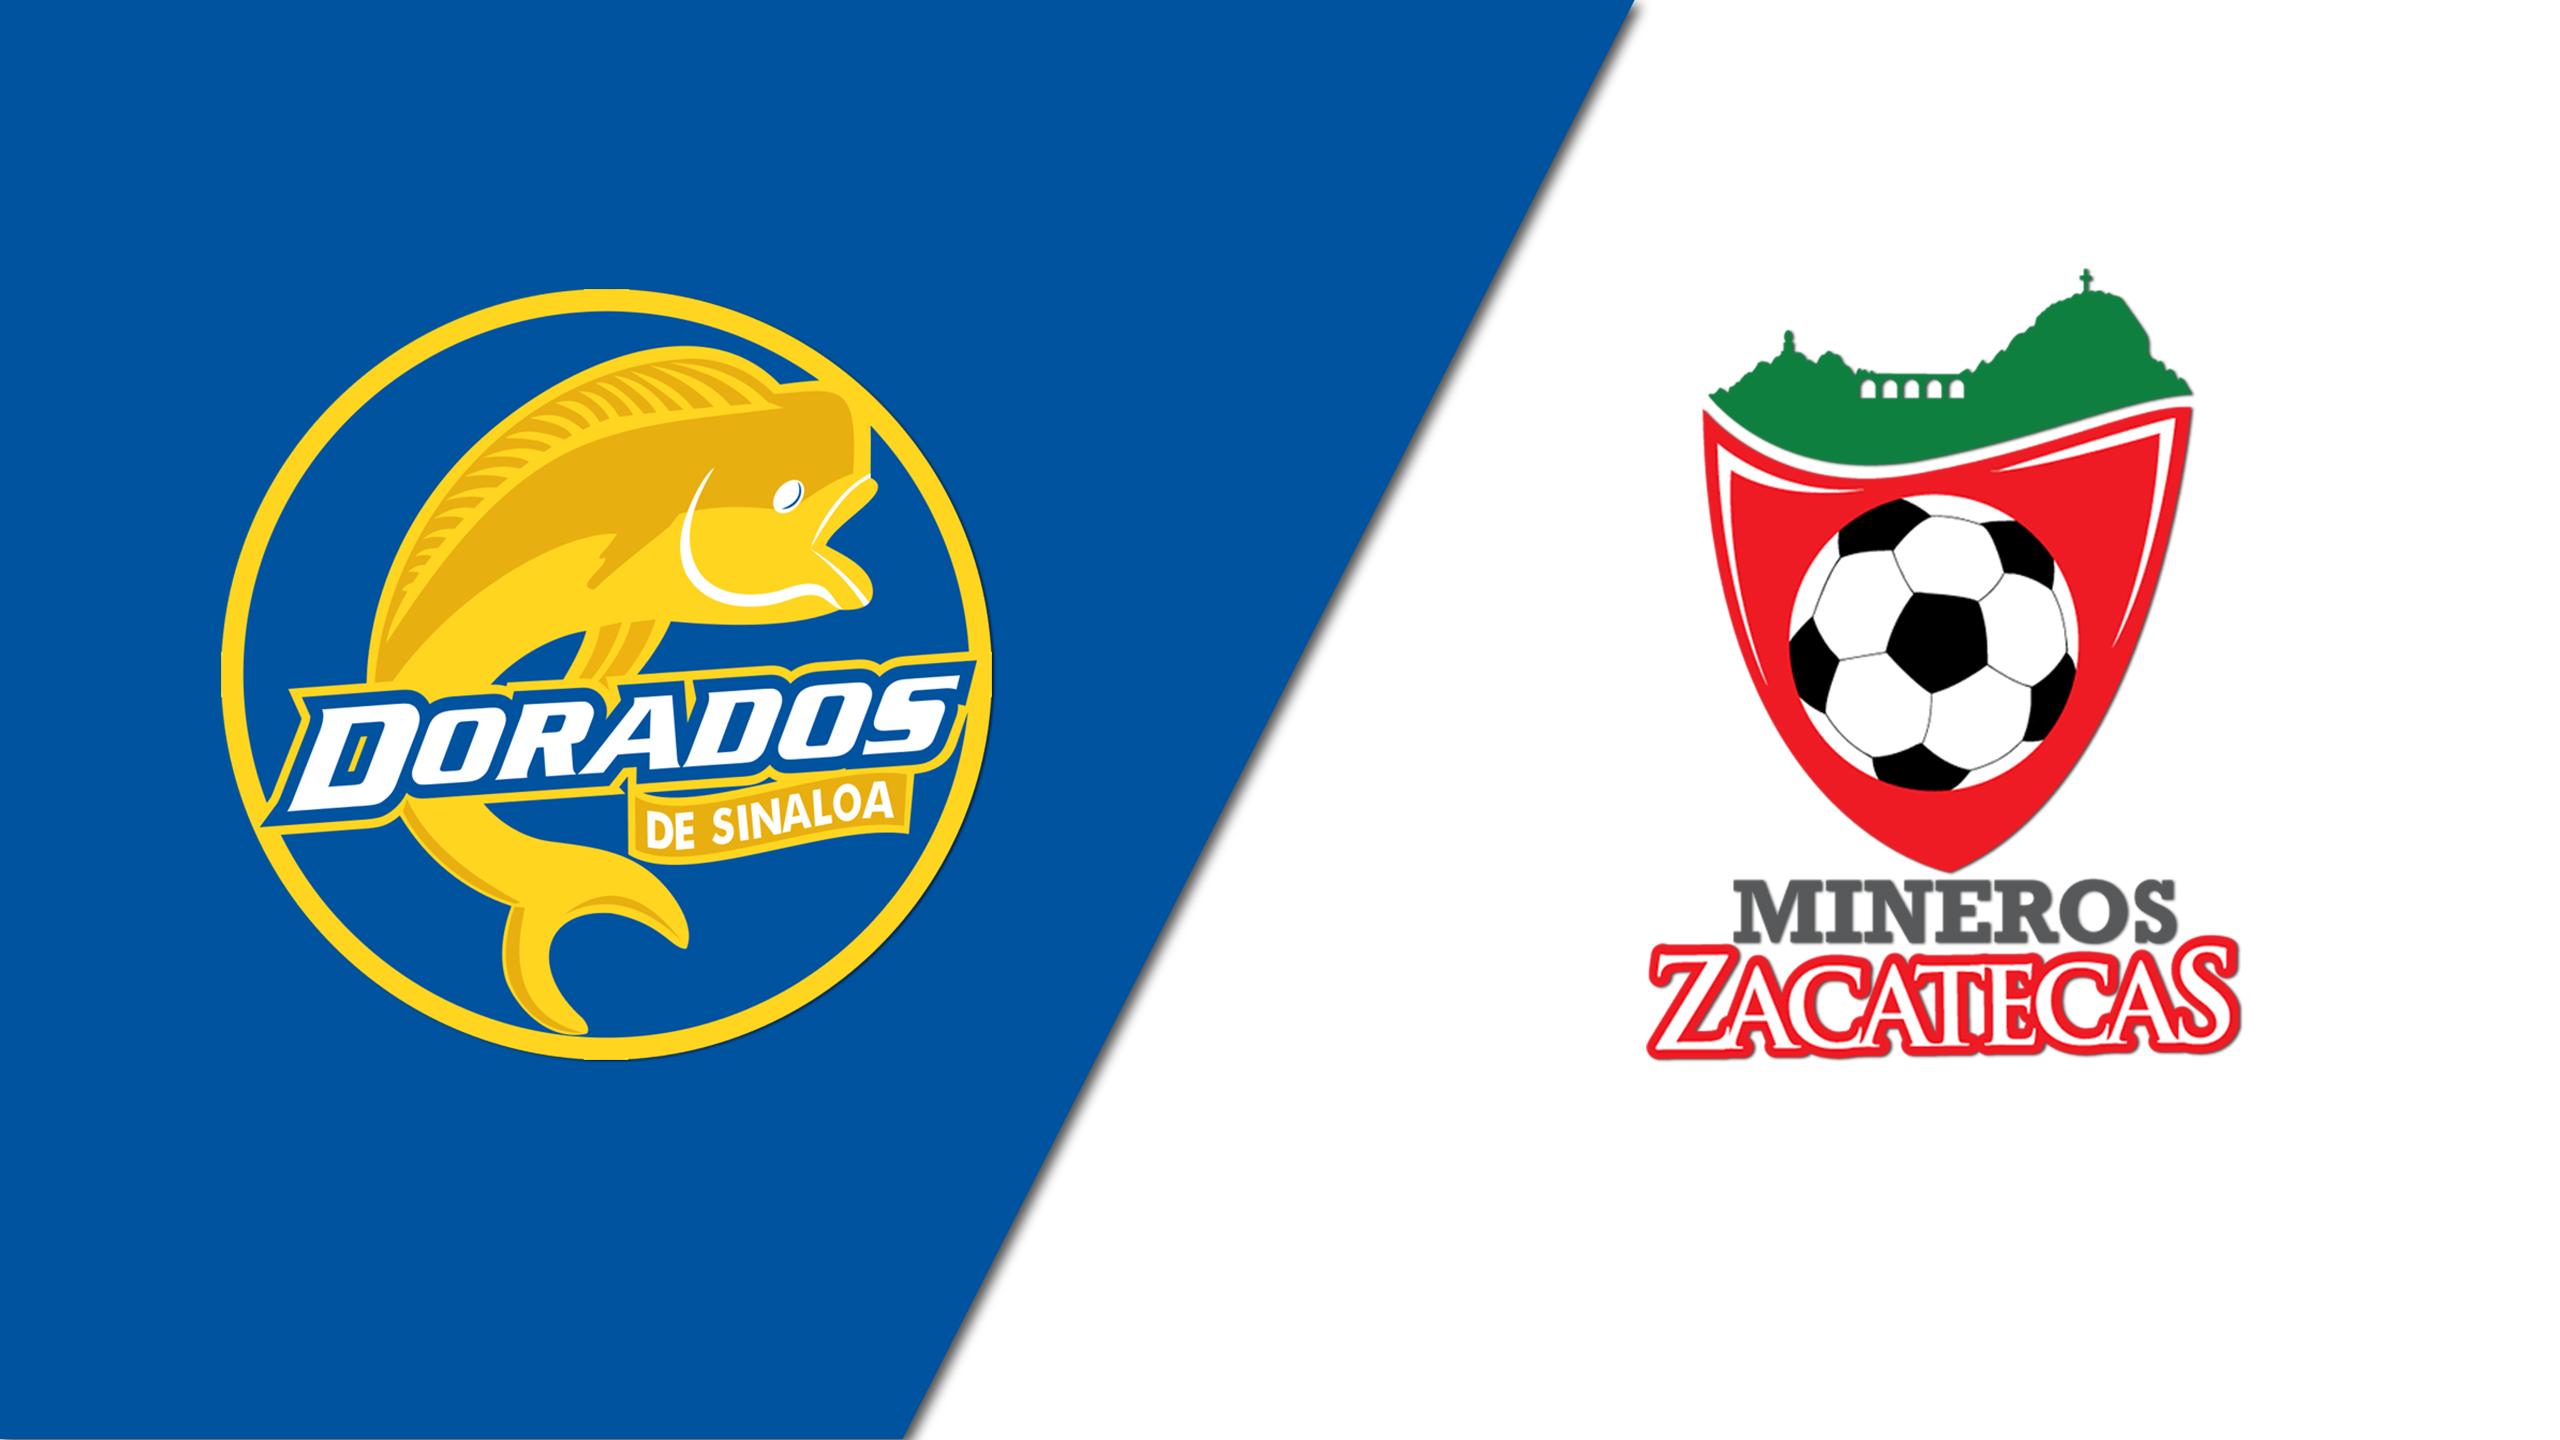 Dorados de Sinaloa vs. Mineros de Zacatecas (Semifinals Leg 1)